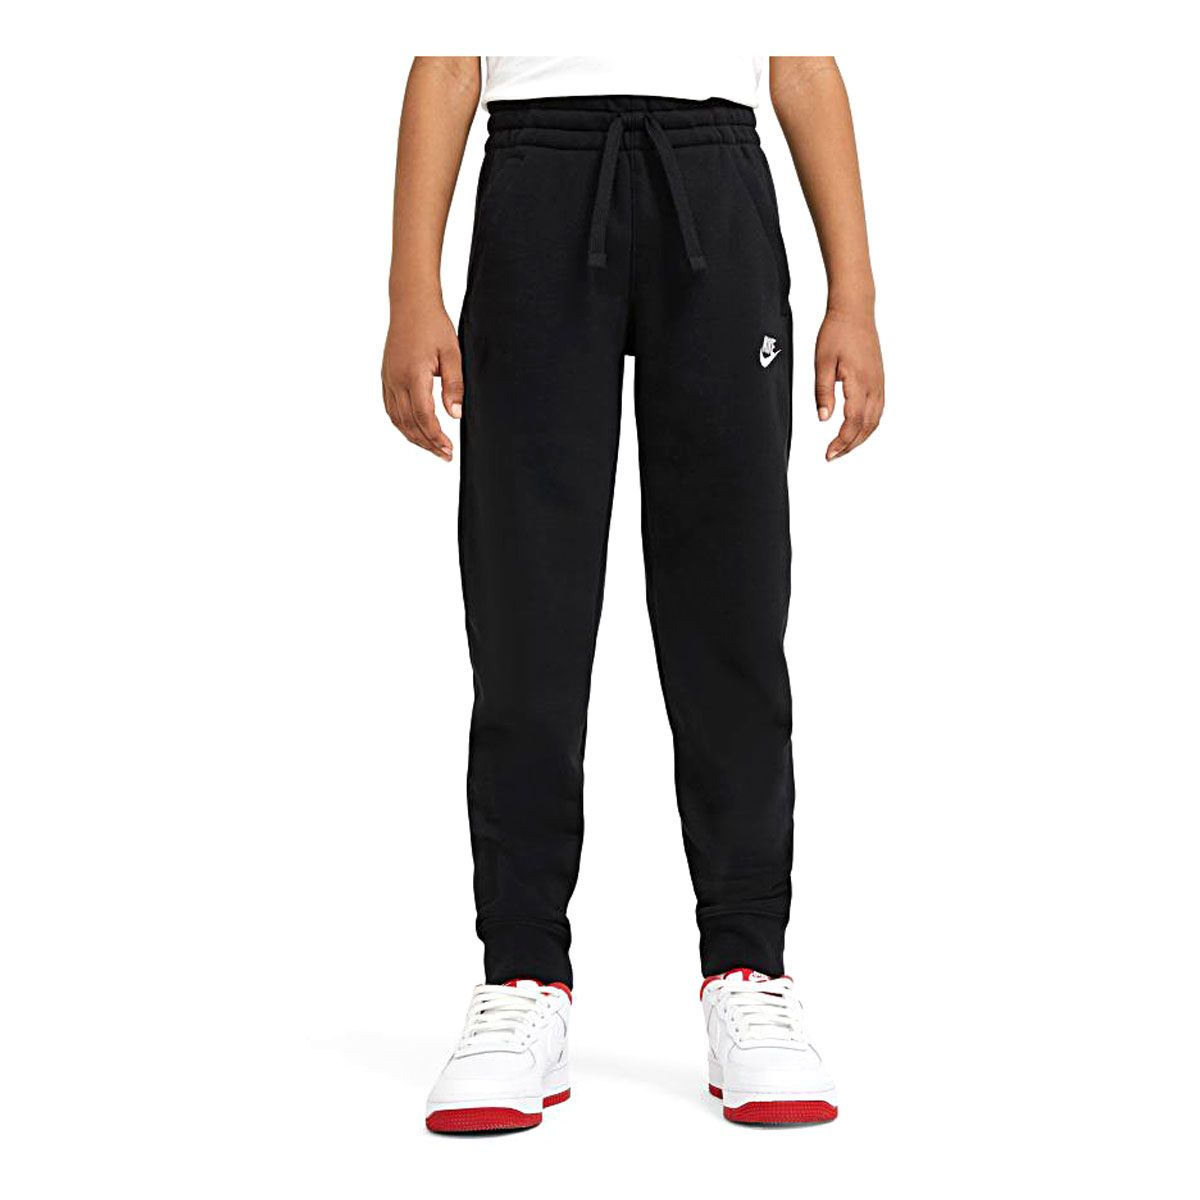 Nike Pantaloni Sportswear Club Bambino Nero Bianco